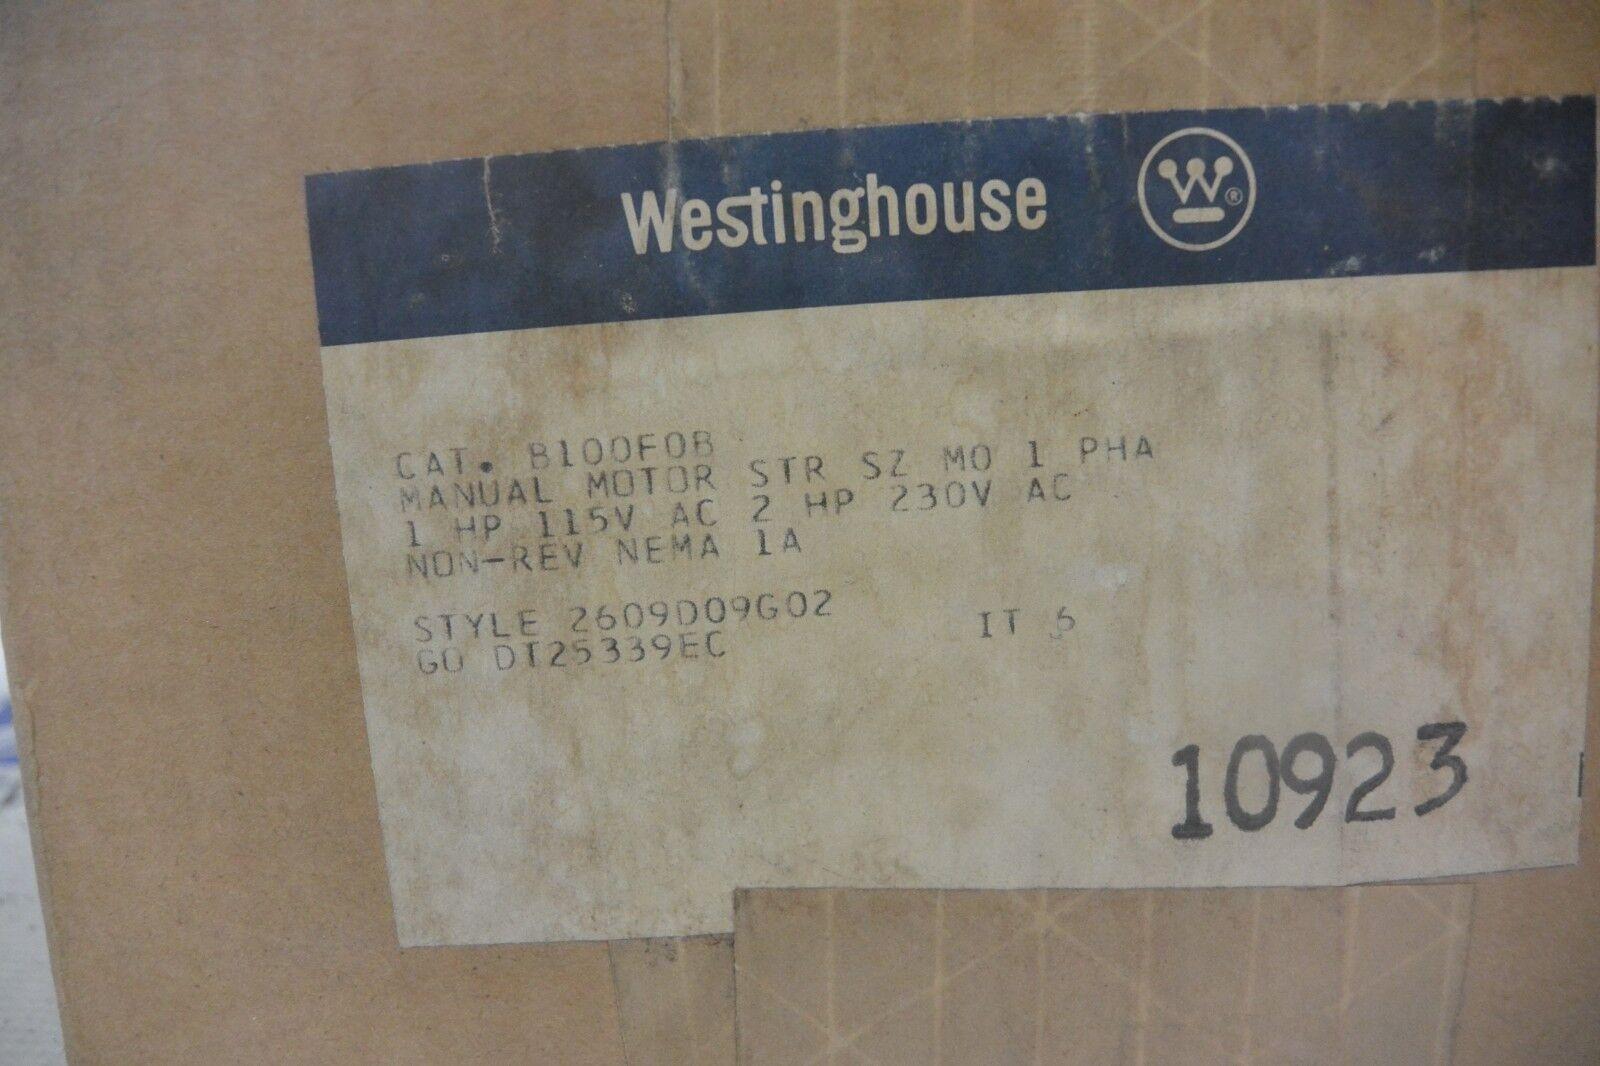 Nuevo Manual Motor De Arranque Westinghouse B100F0B M01 2HP 230V 230V 230V 2609D09G02 4328b9